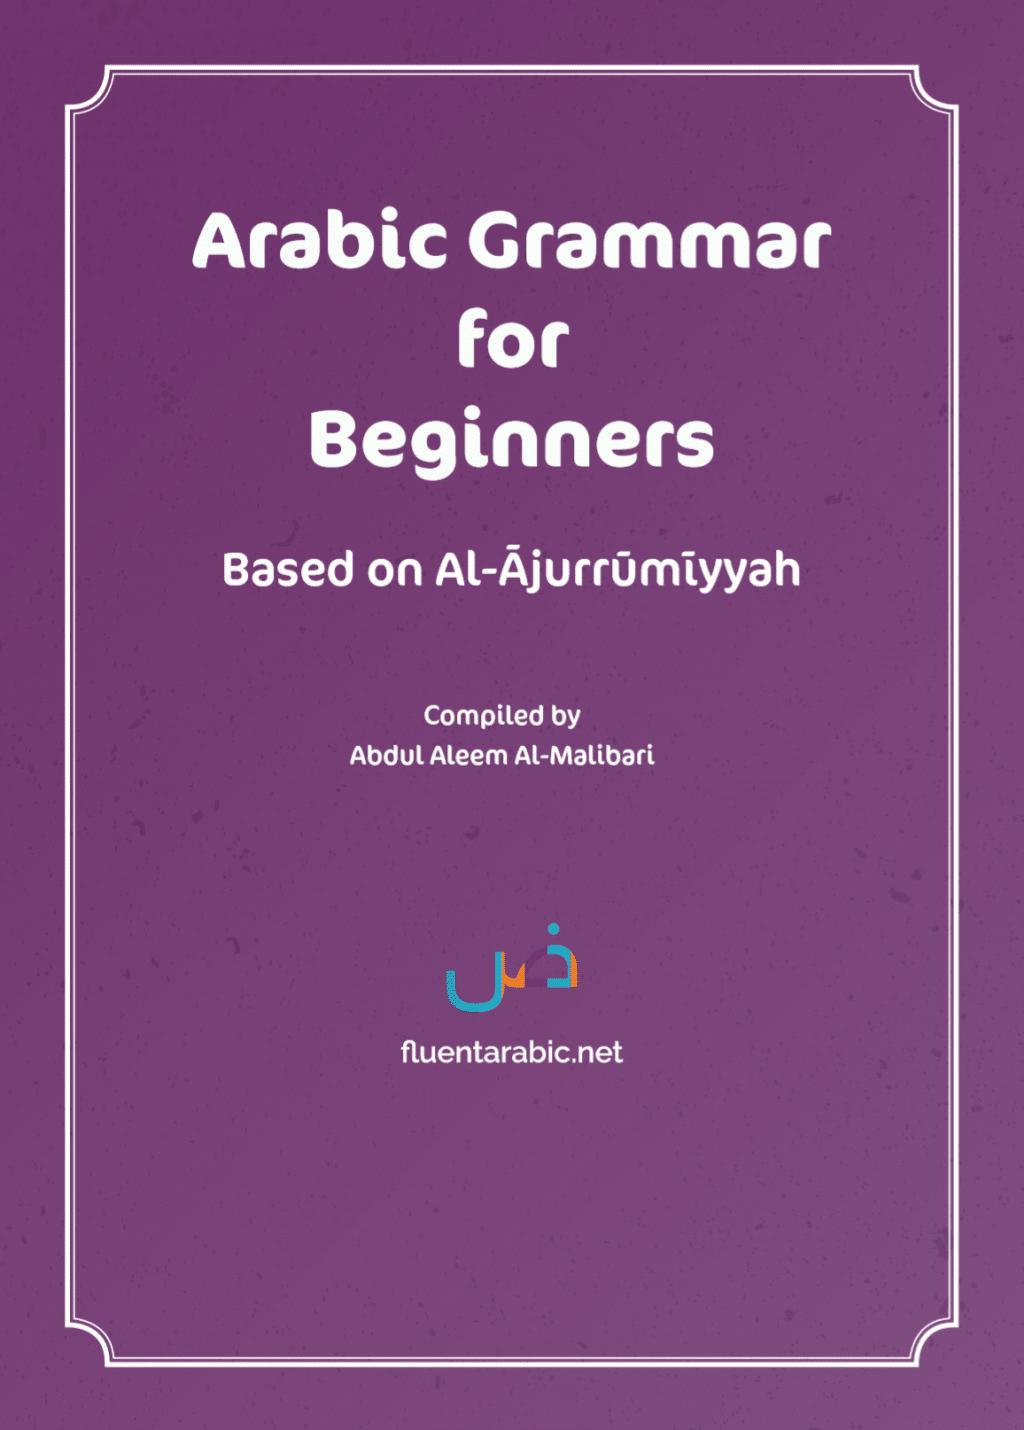 Arabic Grammar For Beginners Based On Al-Ājrūmīyyah (Part 1